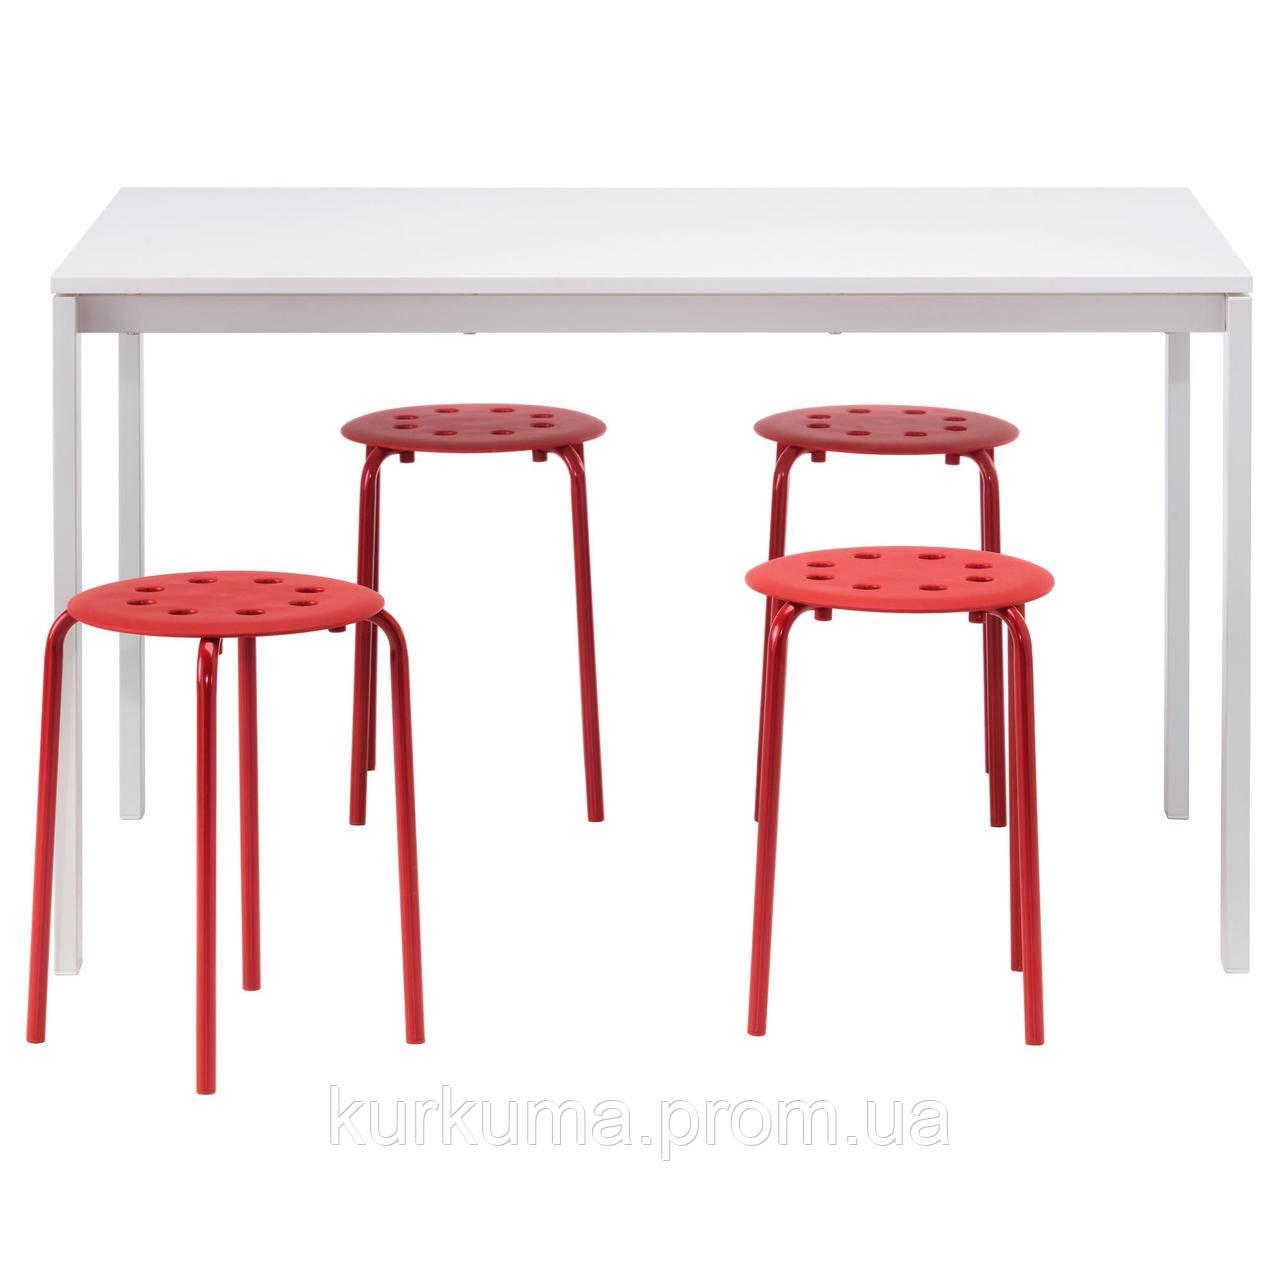 IKEA MELLTORP/MARIUS Стол и 4 стула, белый, красный  (090.107.02)